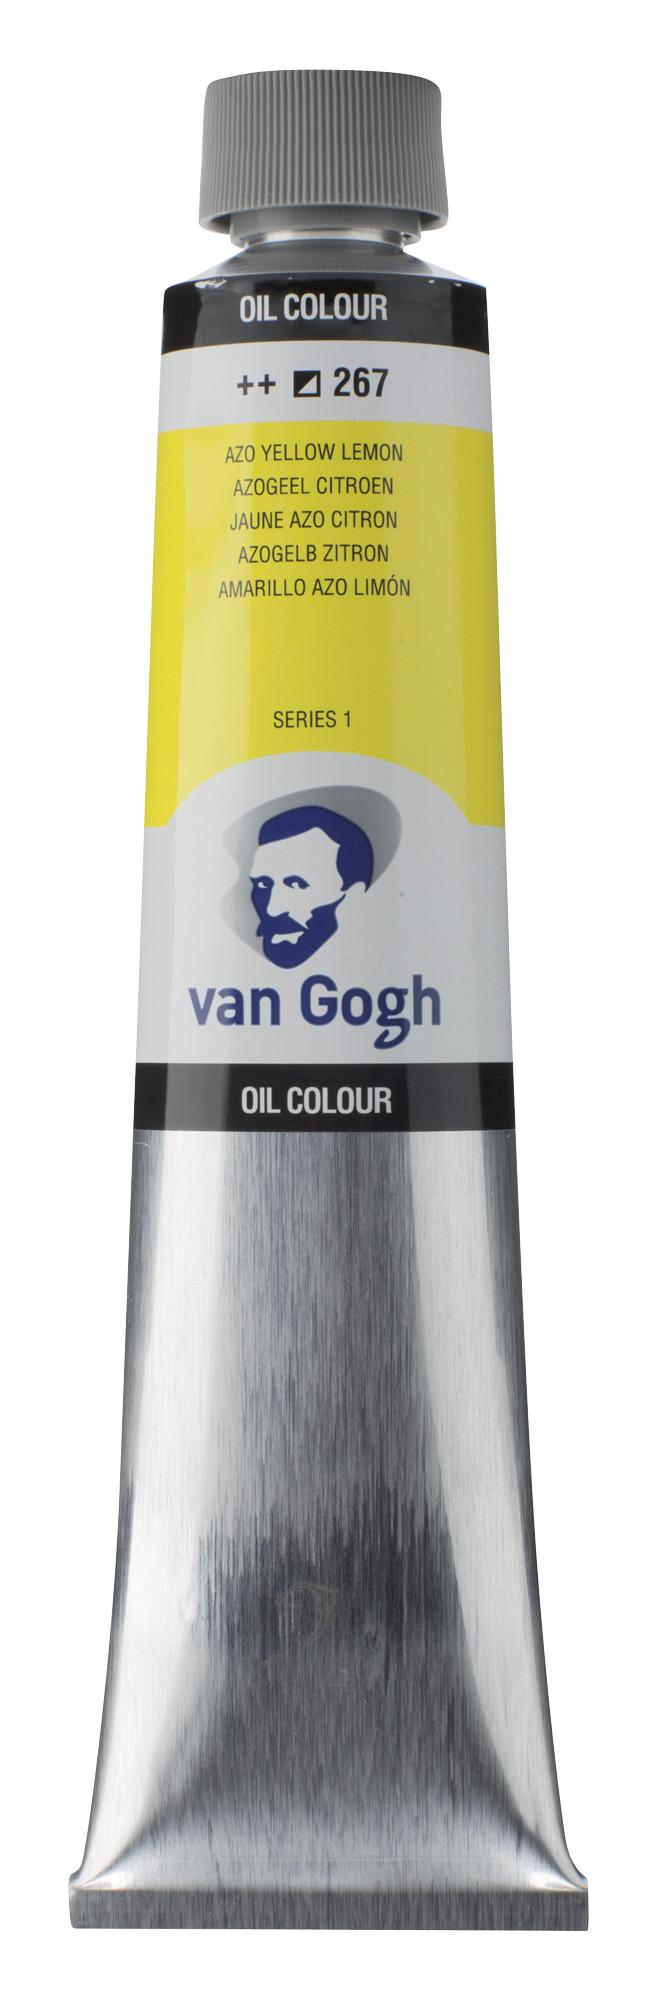 Van Gogh Oil Colour Tube 200 ml Azo Yellow Lemon 267